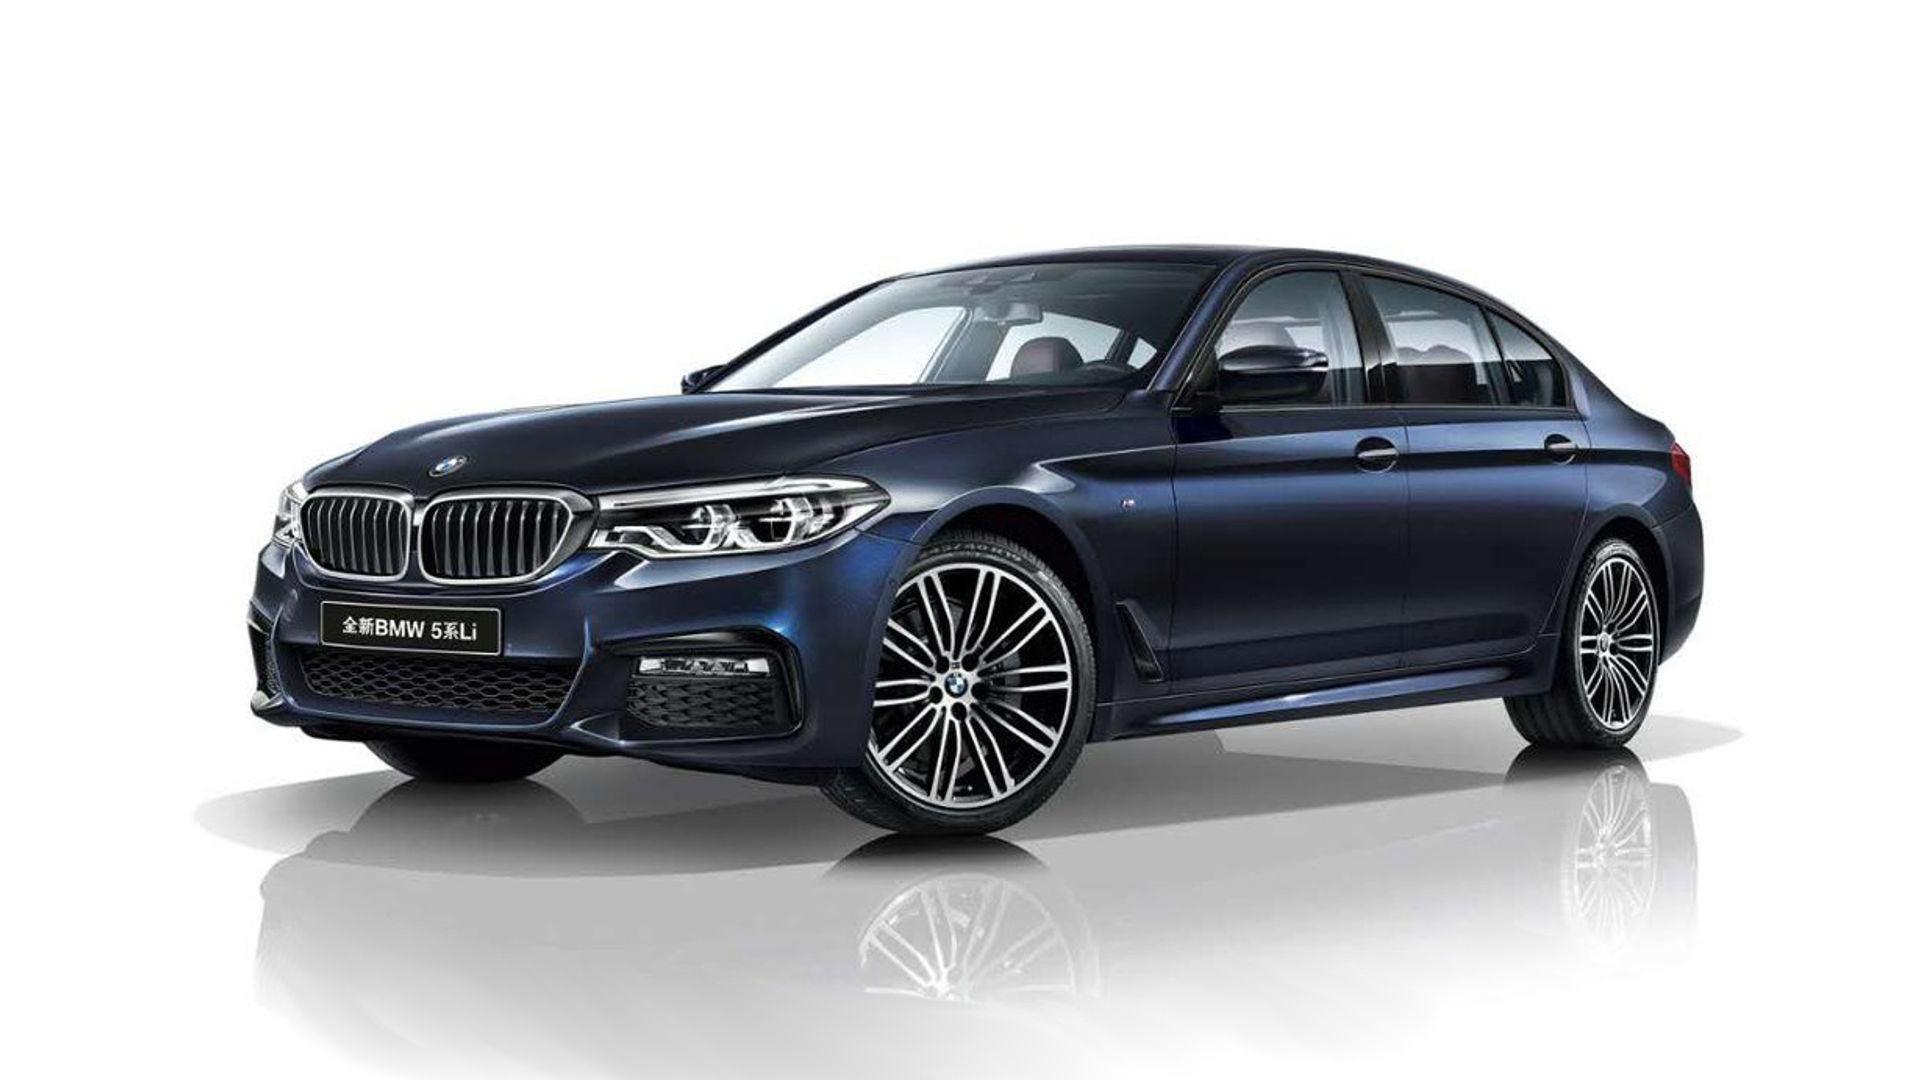 BMW 5 Series Li Long Wheelbase Version Revealed For China